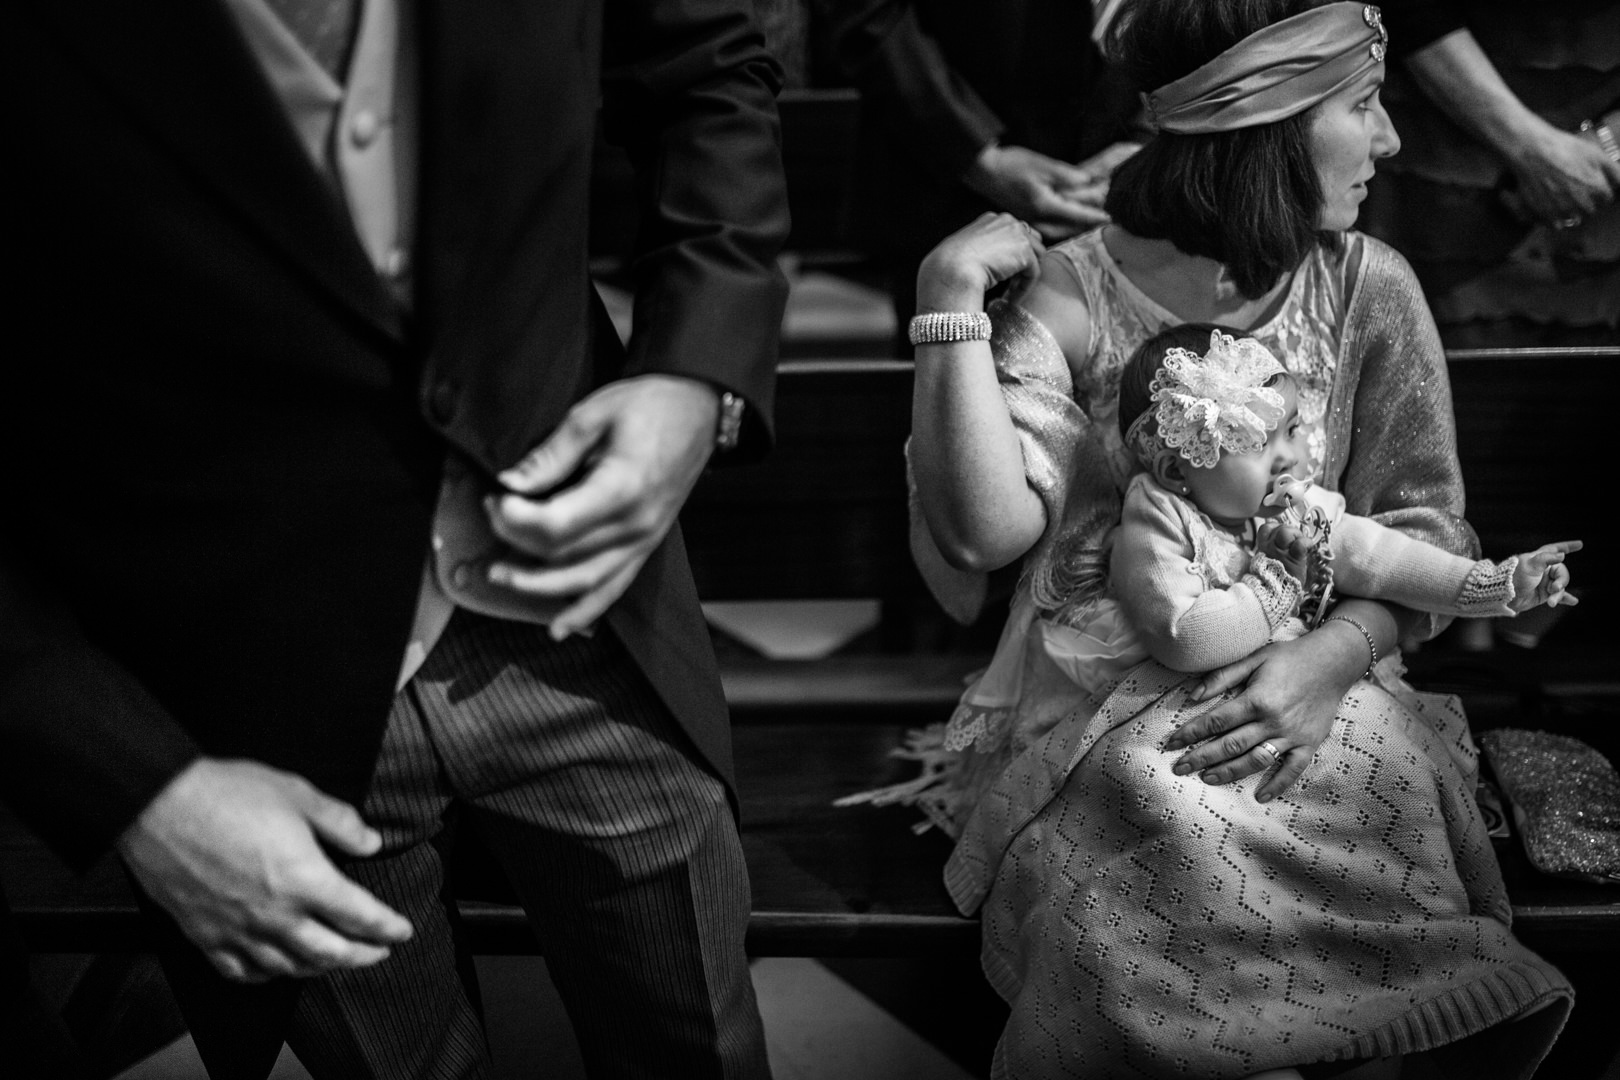 Boda-Catedral-Jaen-Hamburgo-Maria-David-engagement-Rafael-Torres-fotografo-bodas-sevilla-madrid-barcelona-wedding-photographer--22.jpg